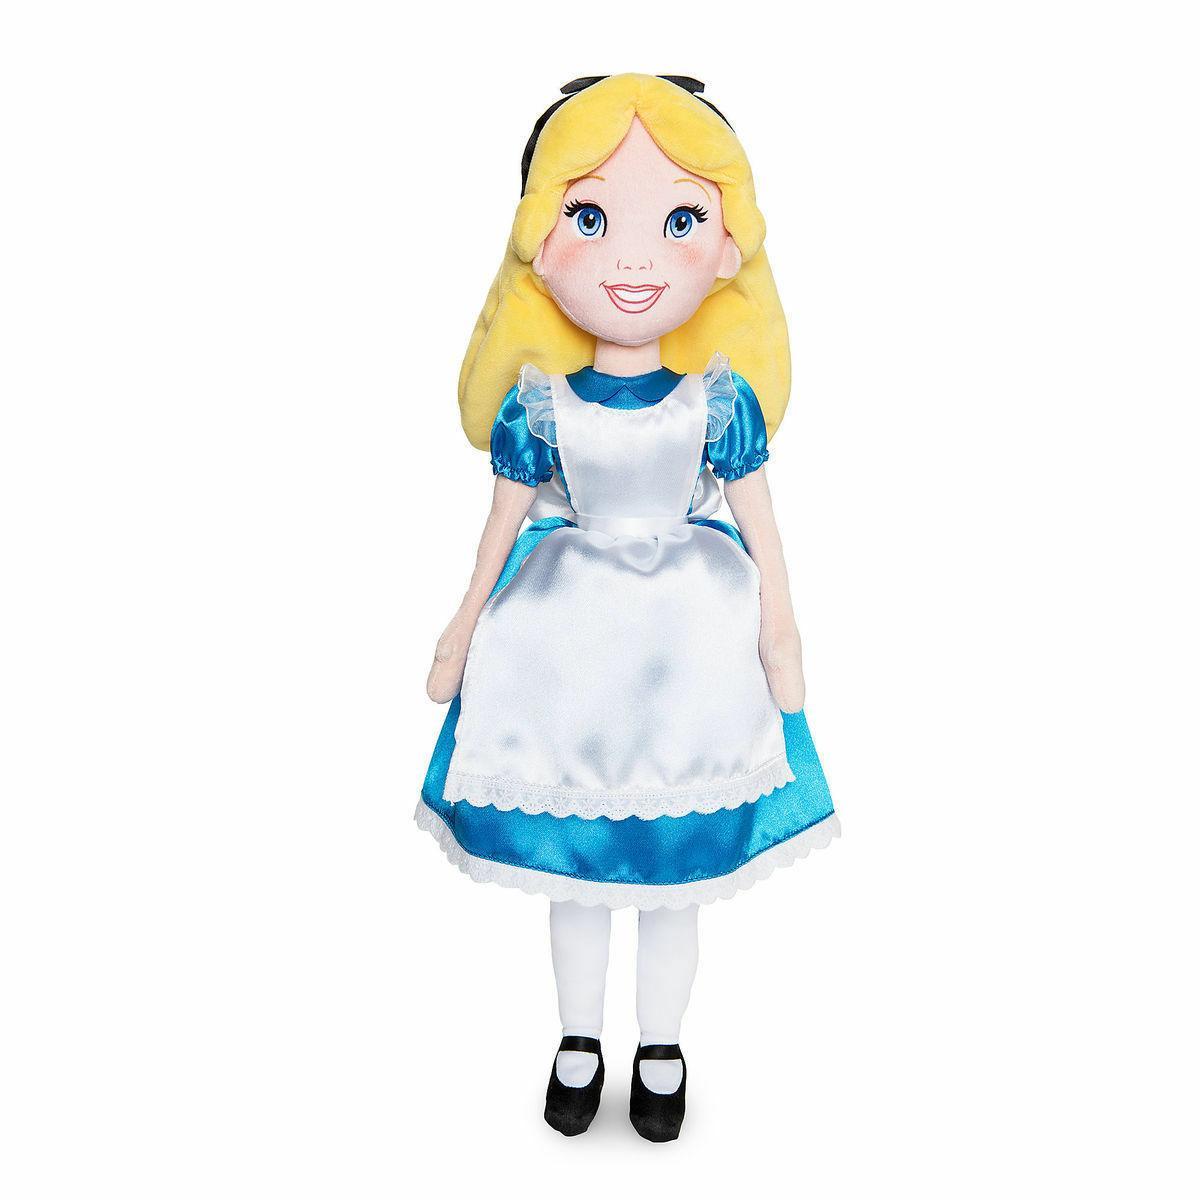 store authentic alice in wonderland plush toy